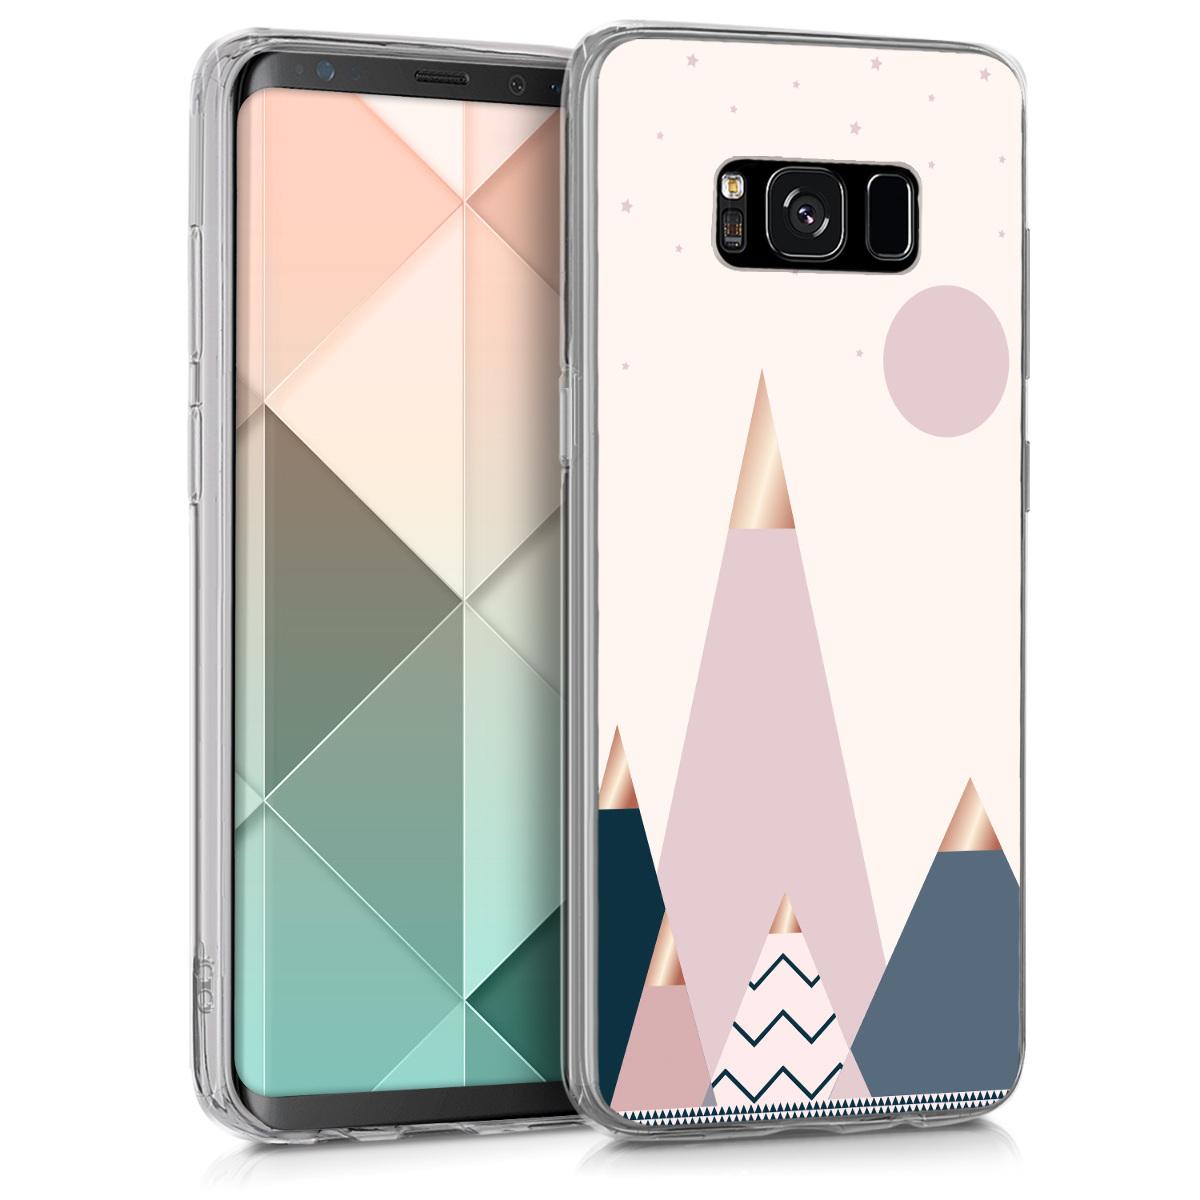 KW Θήκη Σιλικόνης Samsung Galaxy S8 - Rose Gold / Blue / Light Pink (41784.49)